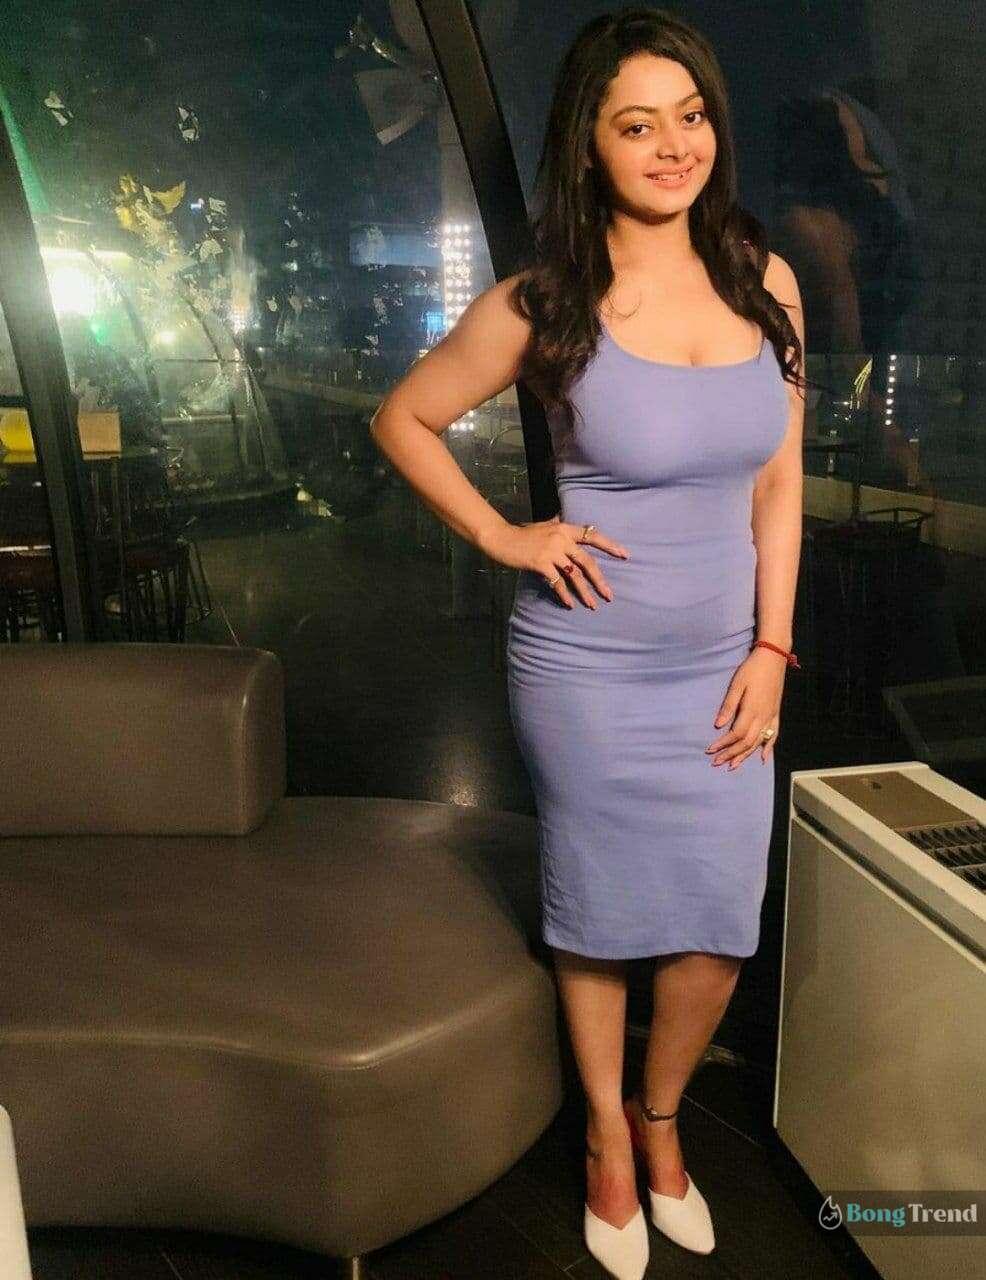 sharmistha acharjee